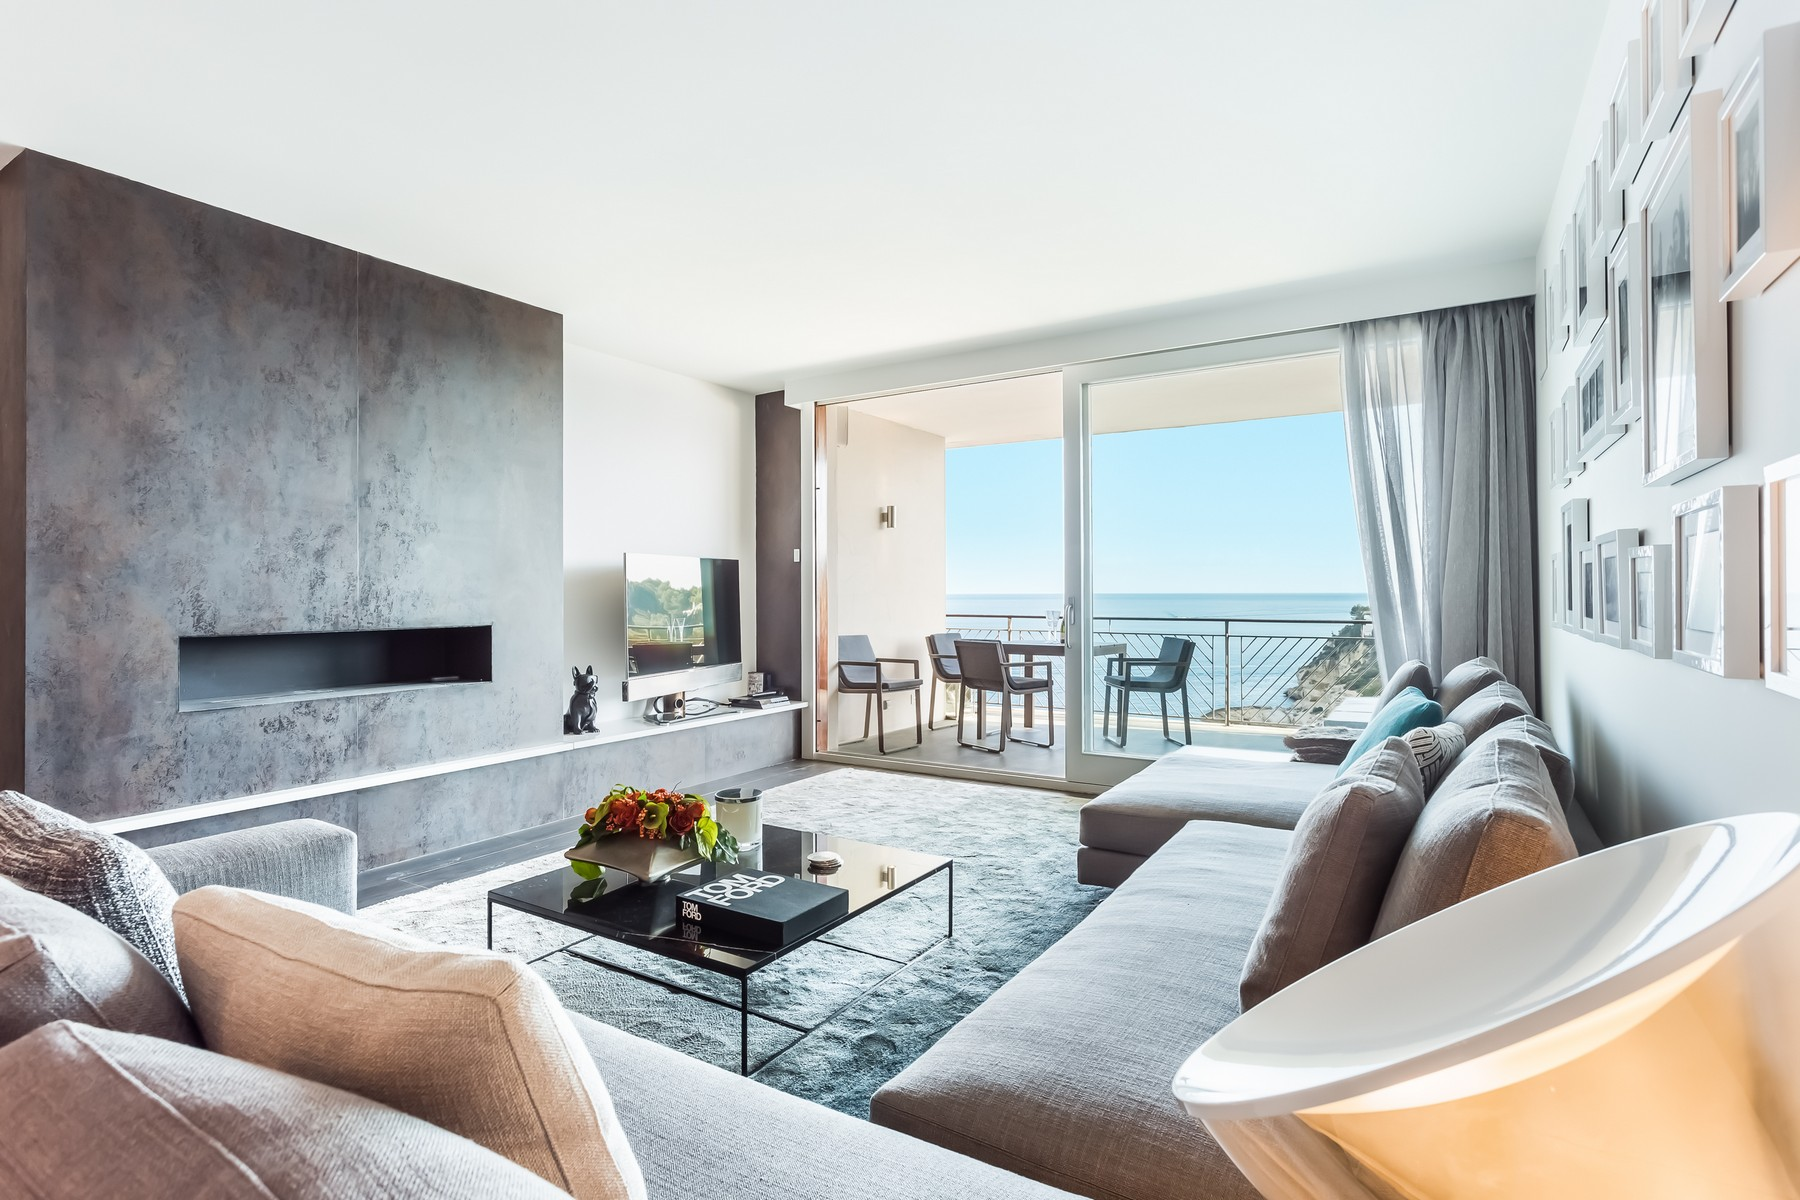 Wohnung für Verkauf beim Luxurious seafront penthouse in Sol de Mallorca Sol De Mallorca, Mallorca, 07180 Spanien